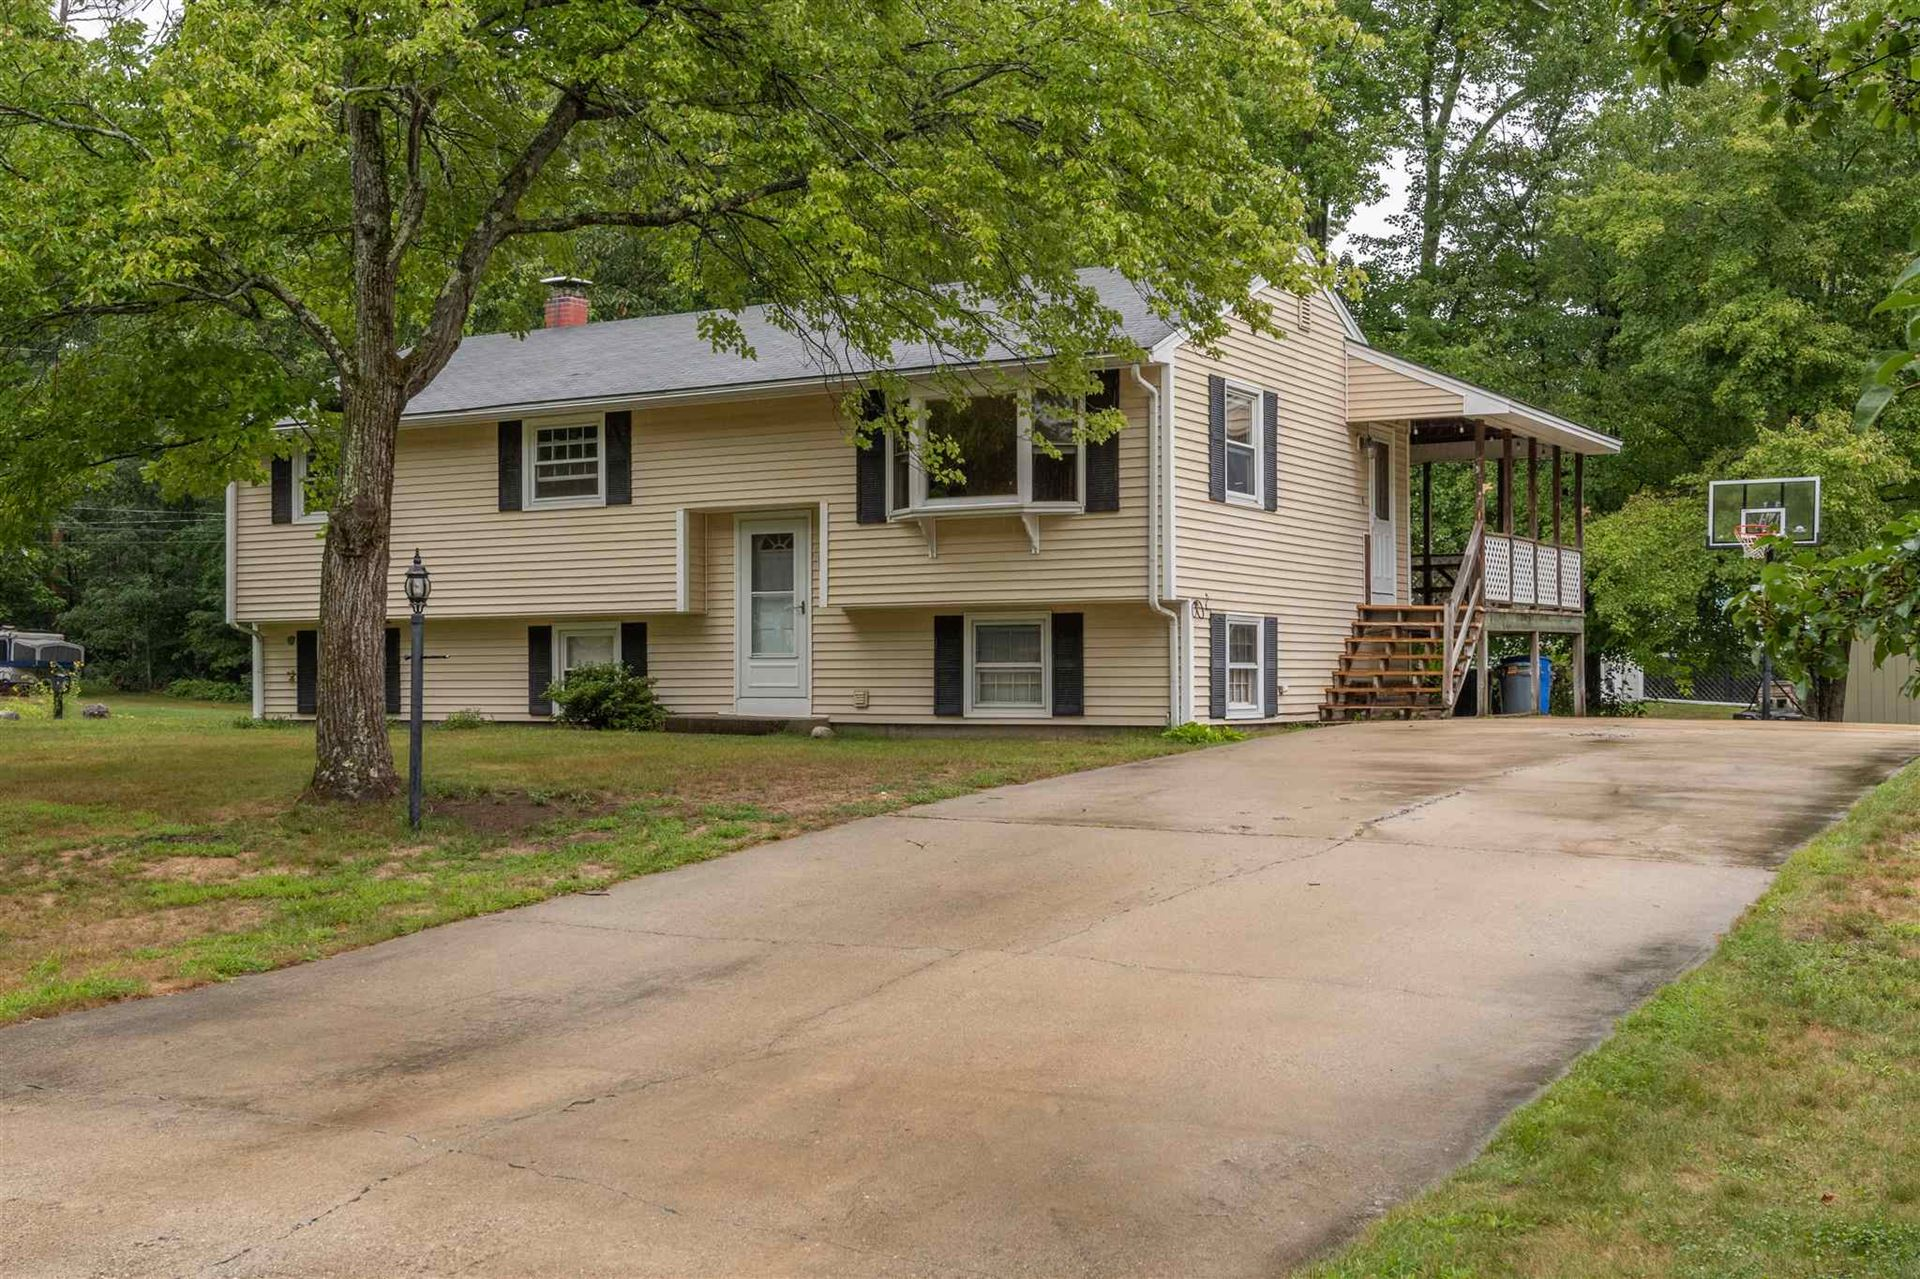 3 Country Club Lane, Merrimack, NH 03054 - MLS#: 4826937